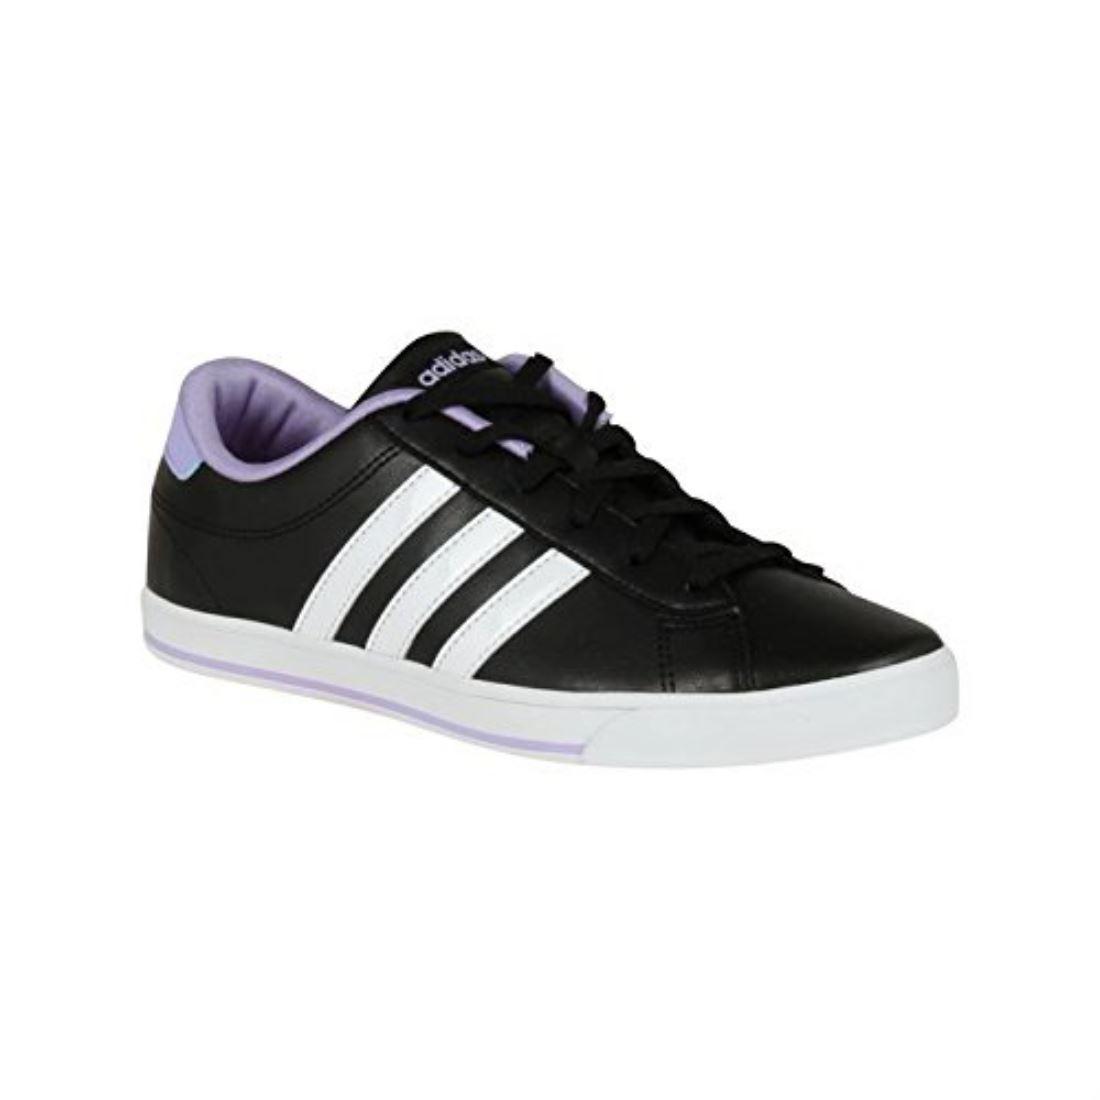 Usc Sale Womens Shoes